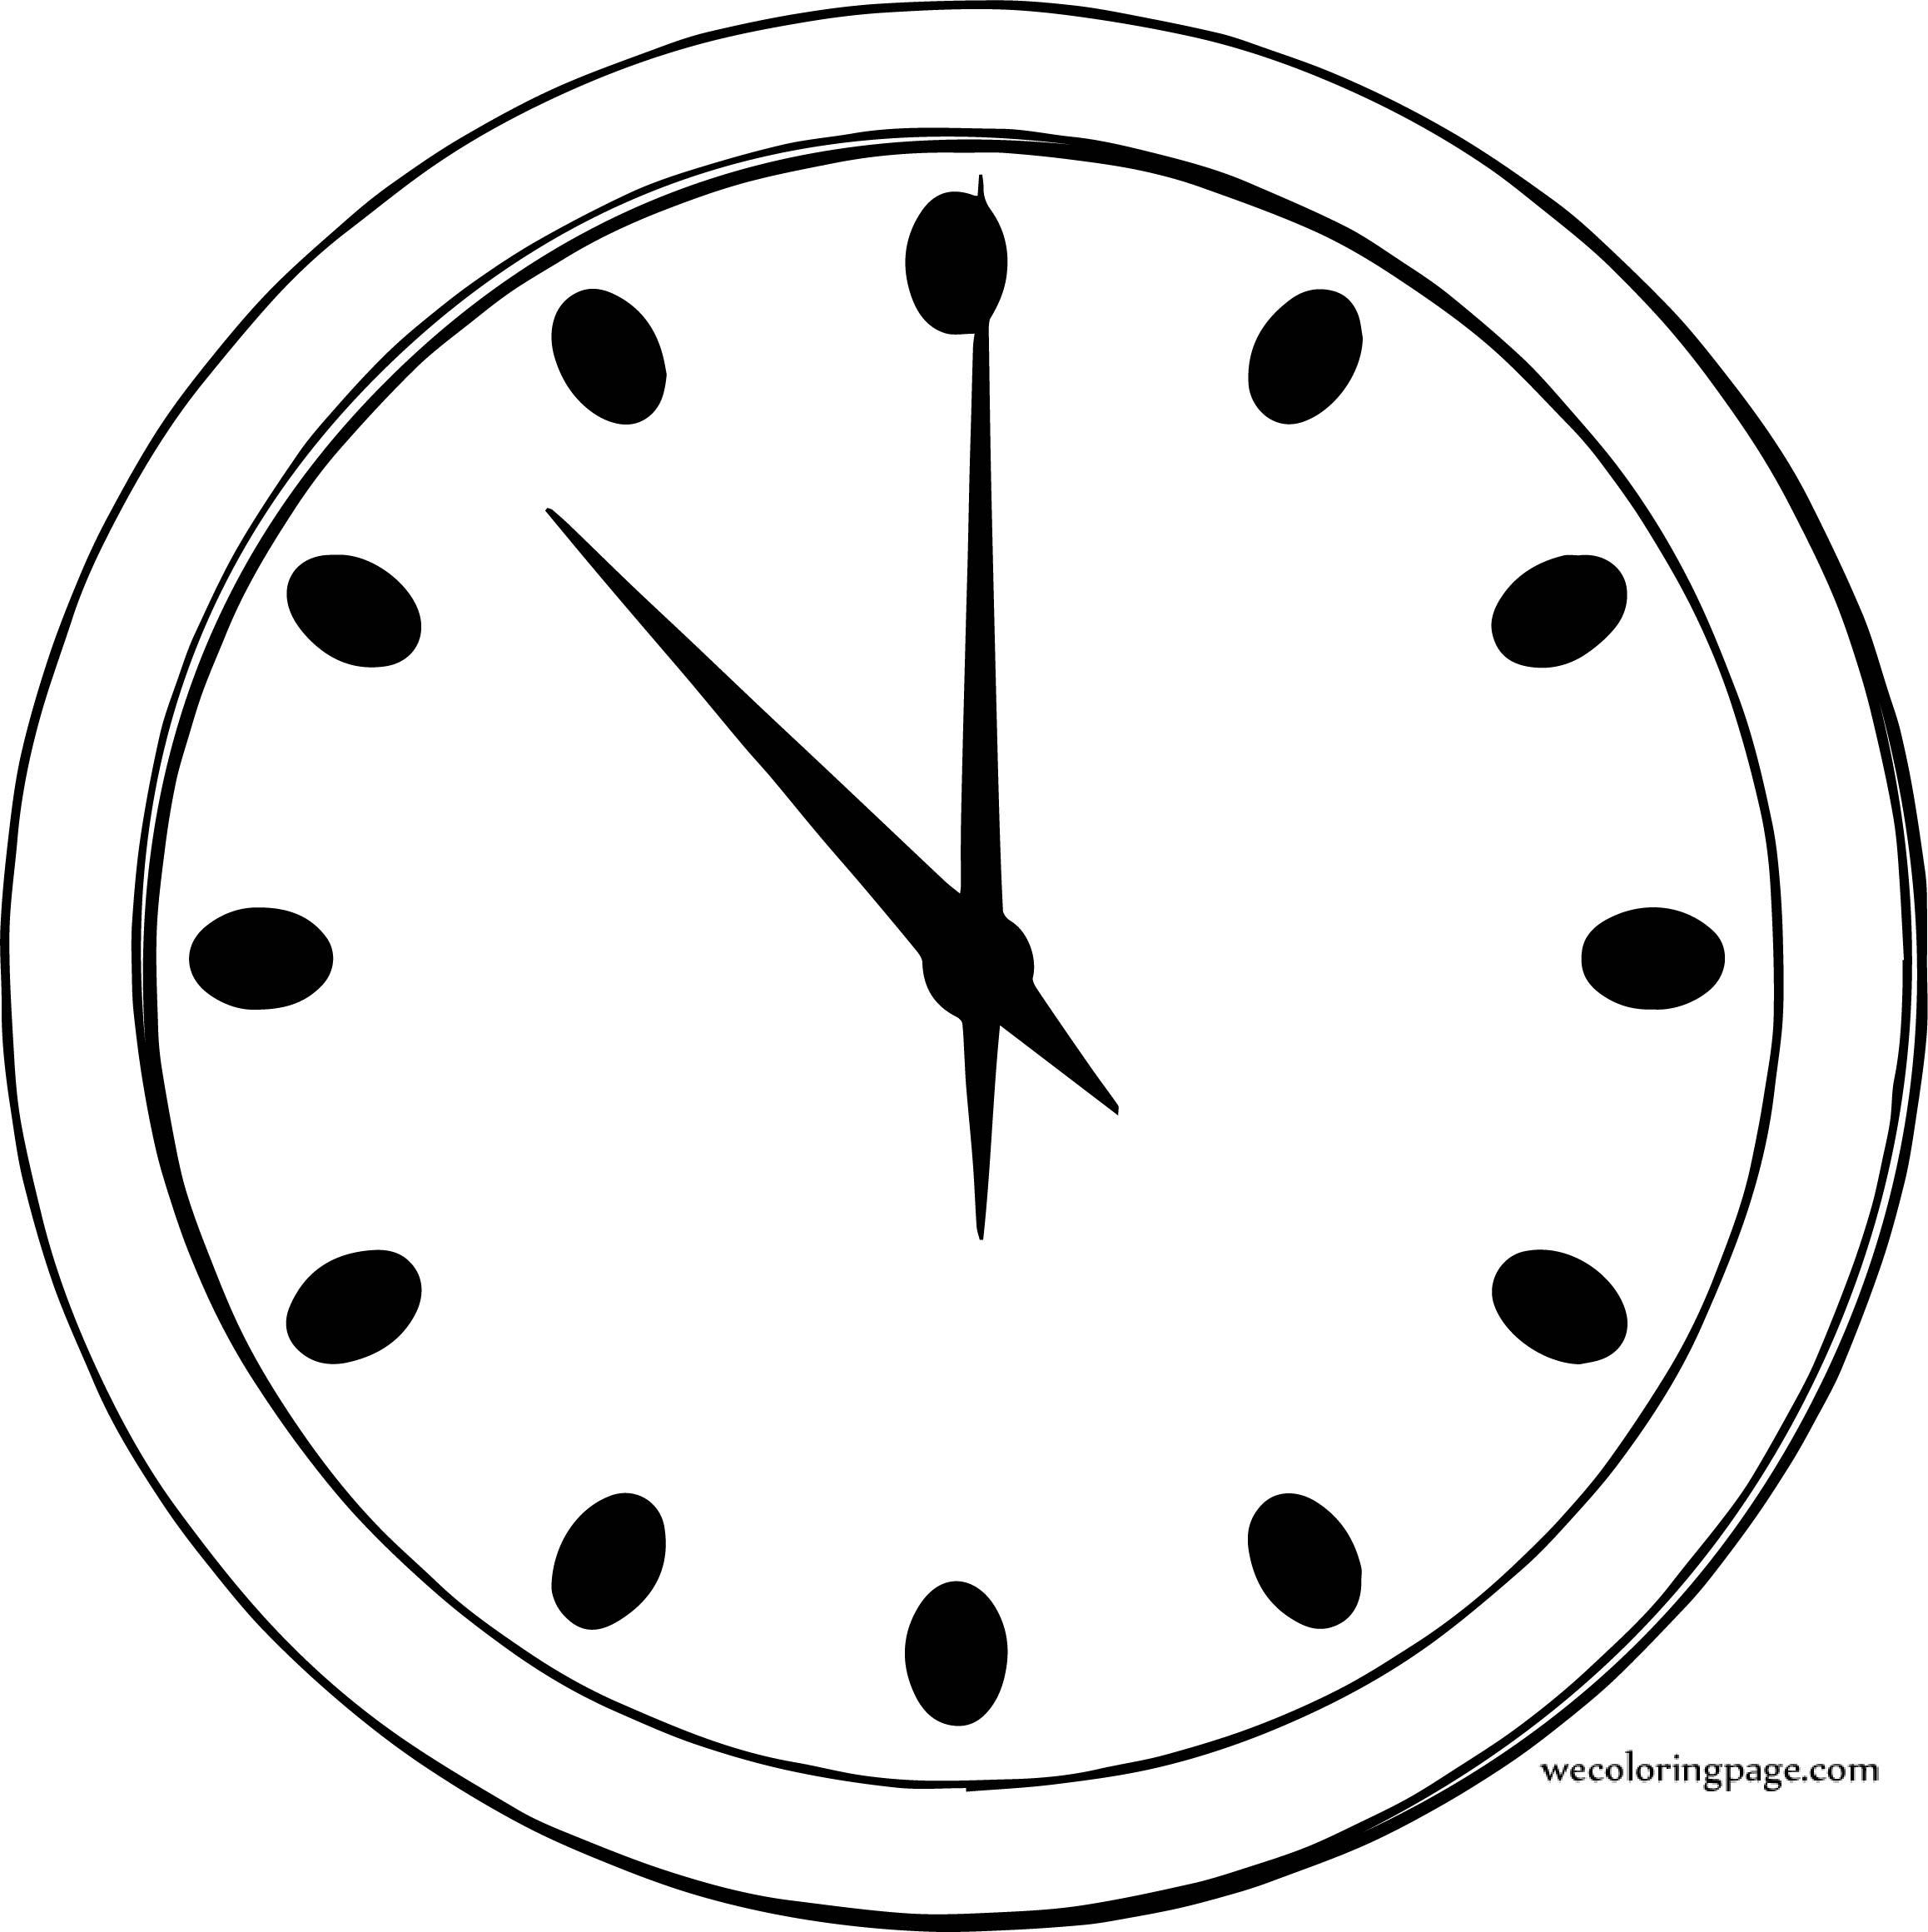 Football Clock Coloring Page